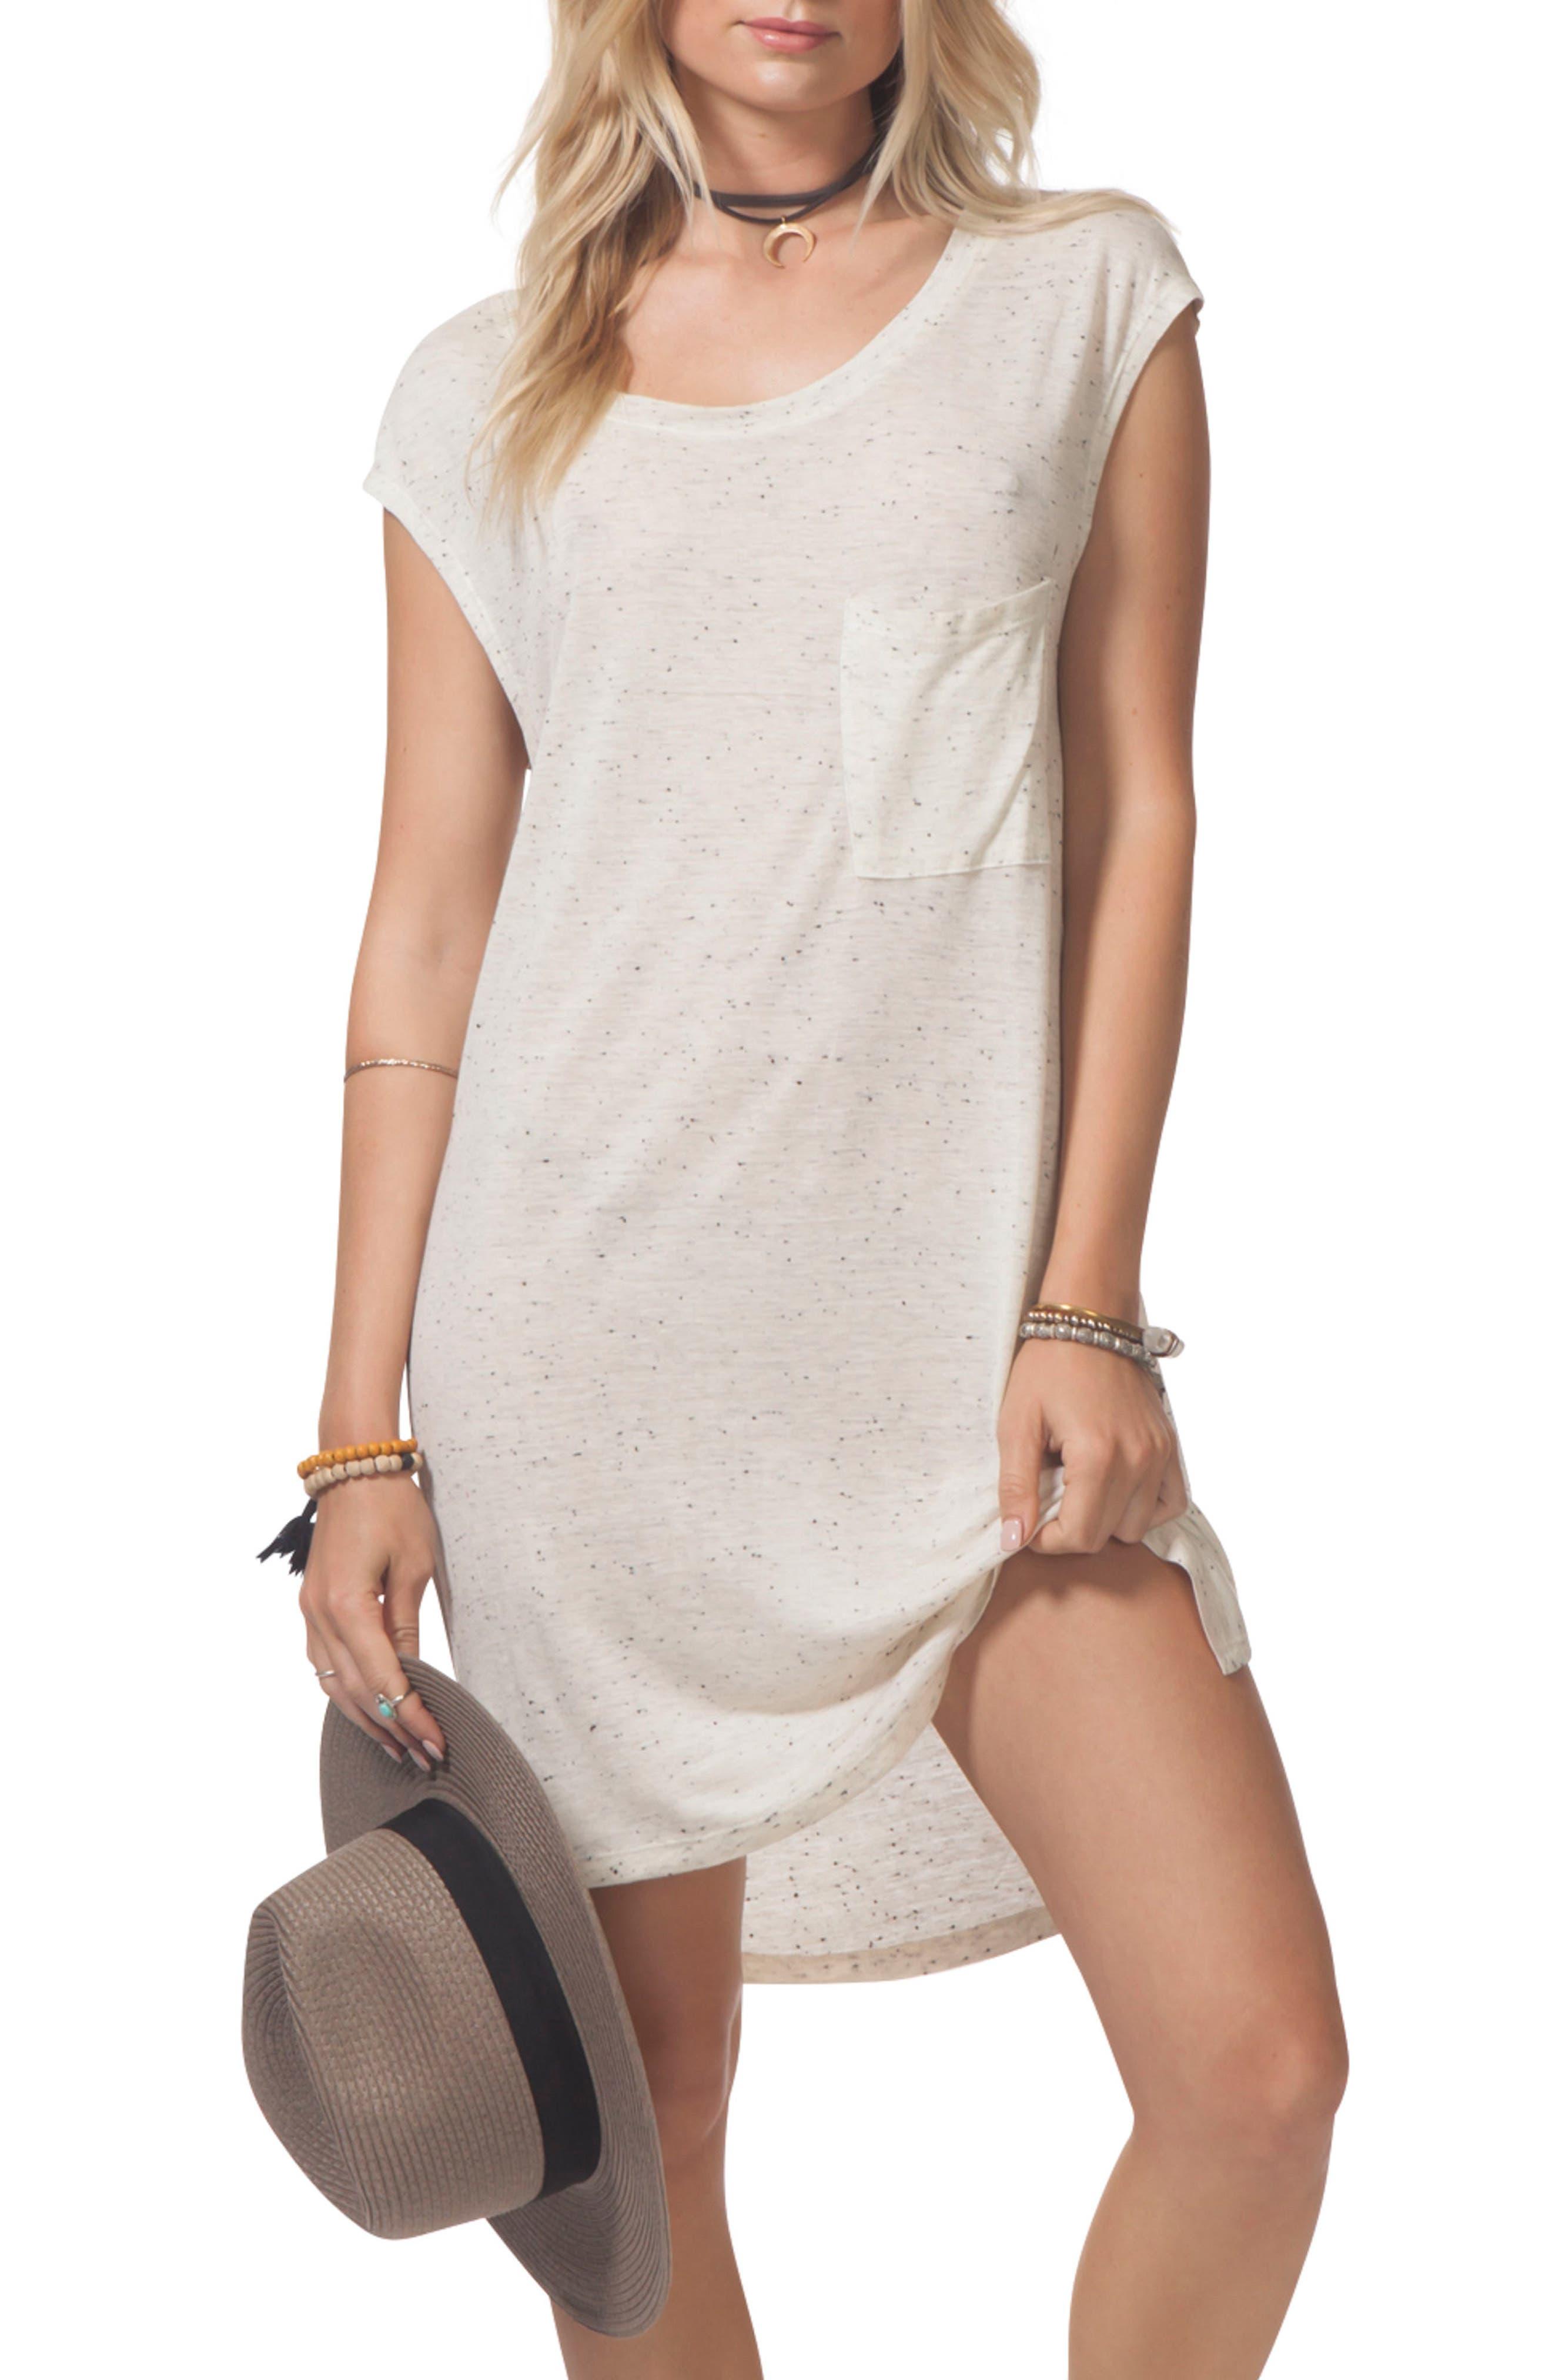 Alternate Image 1 Selected - Rip Curl Premium Surf Knit Dress